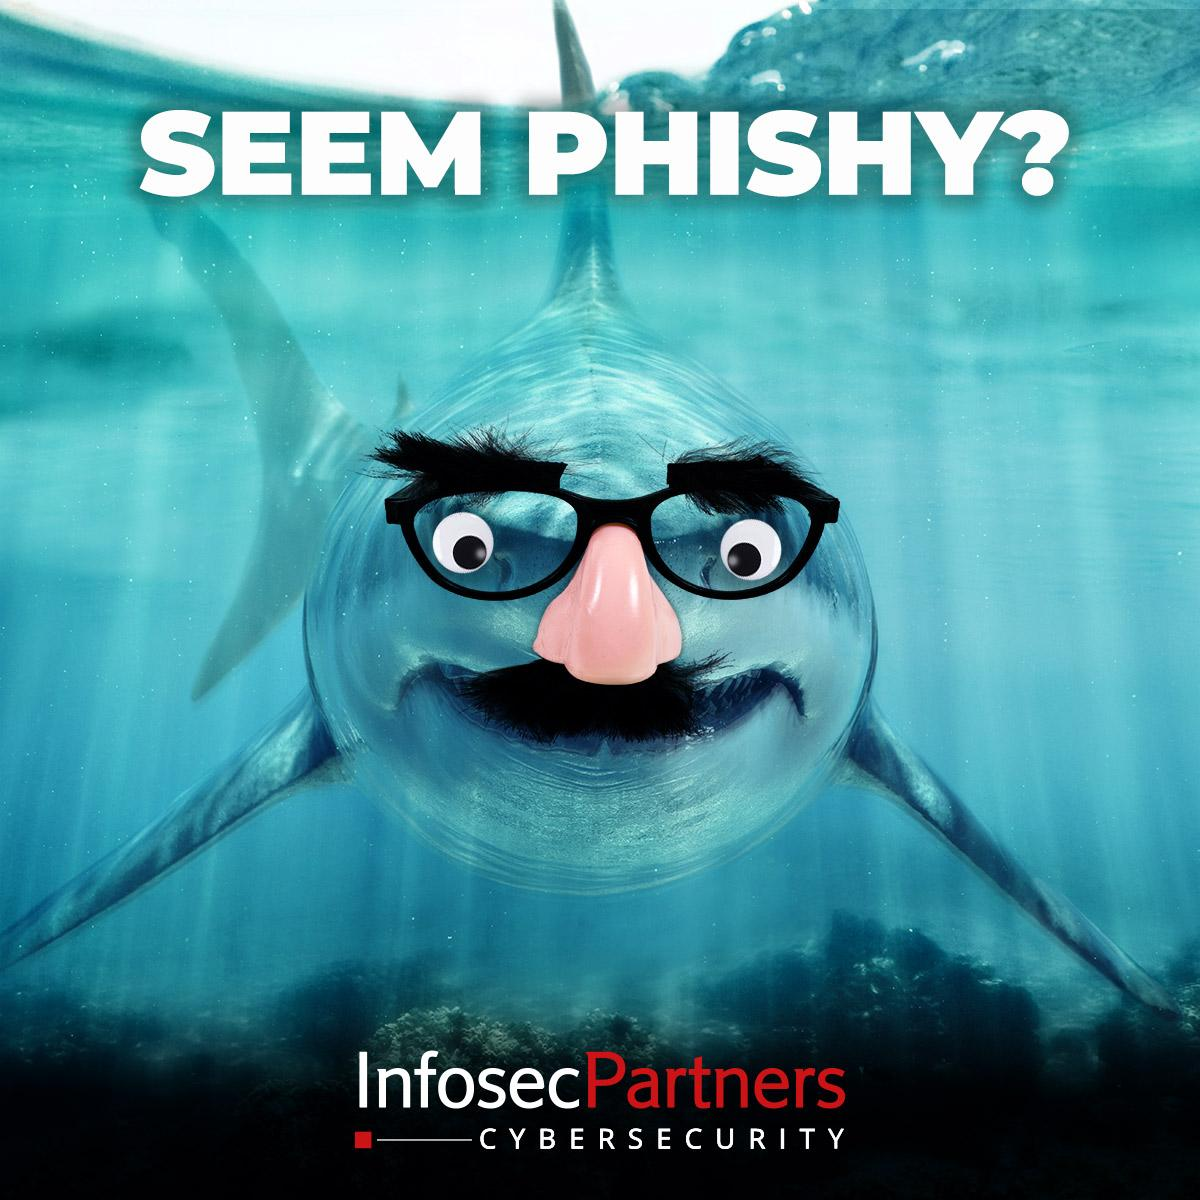 seem phishy? cyber risk aware - phishing awreness